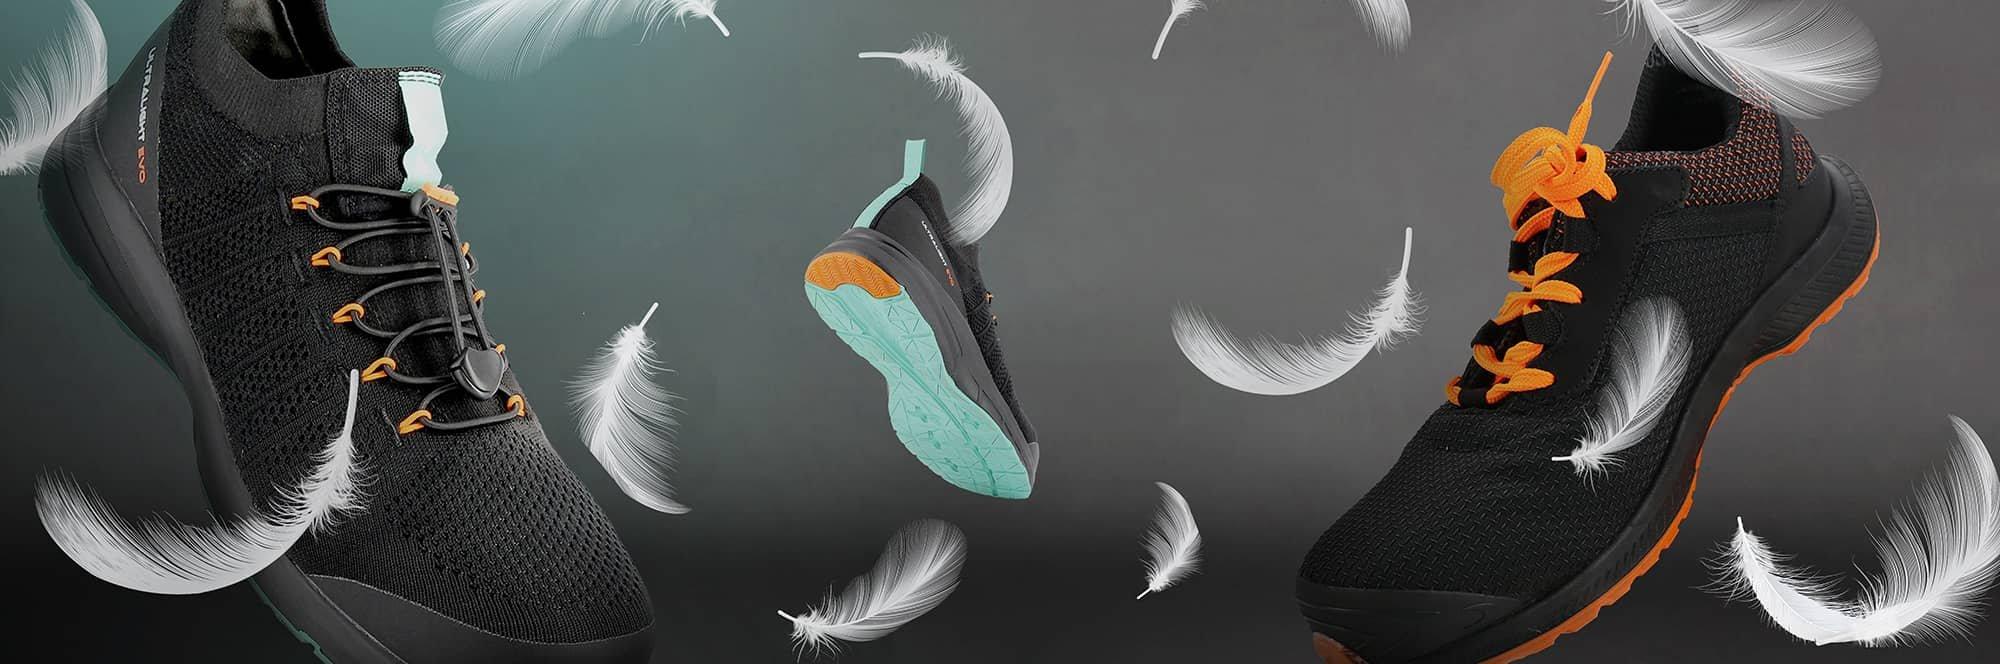 X1500 Workwear Kraft Hiver Pantalon Blaklader Travail De xIYBgw0q8